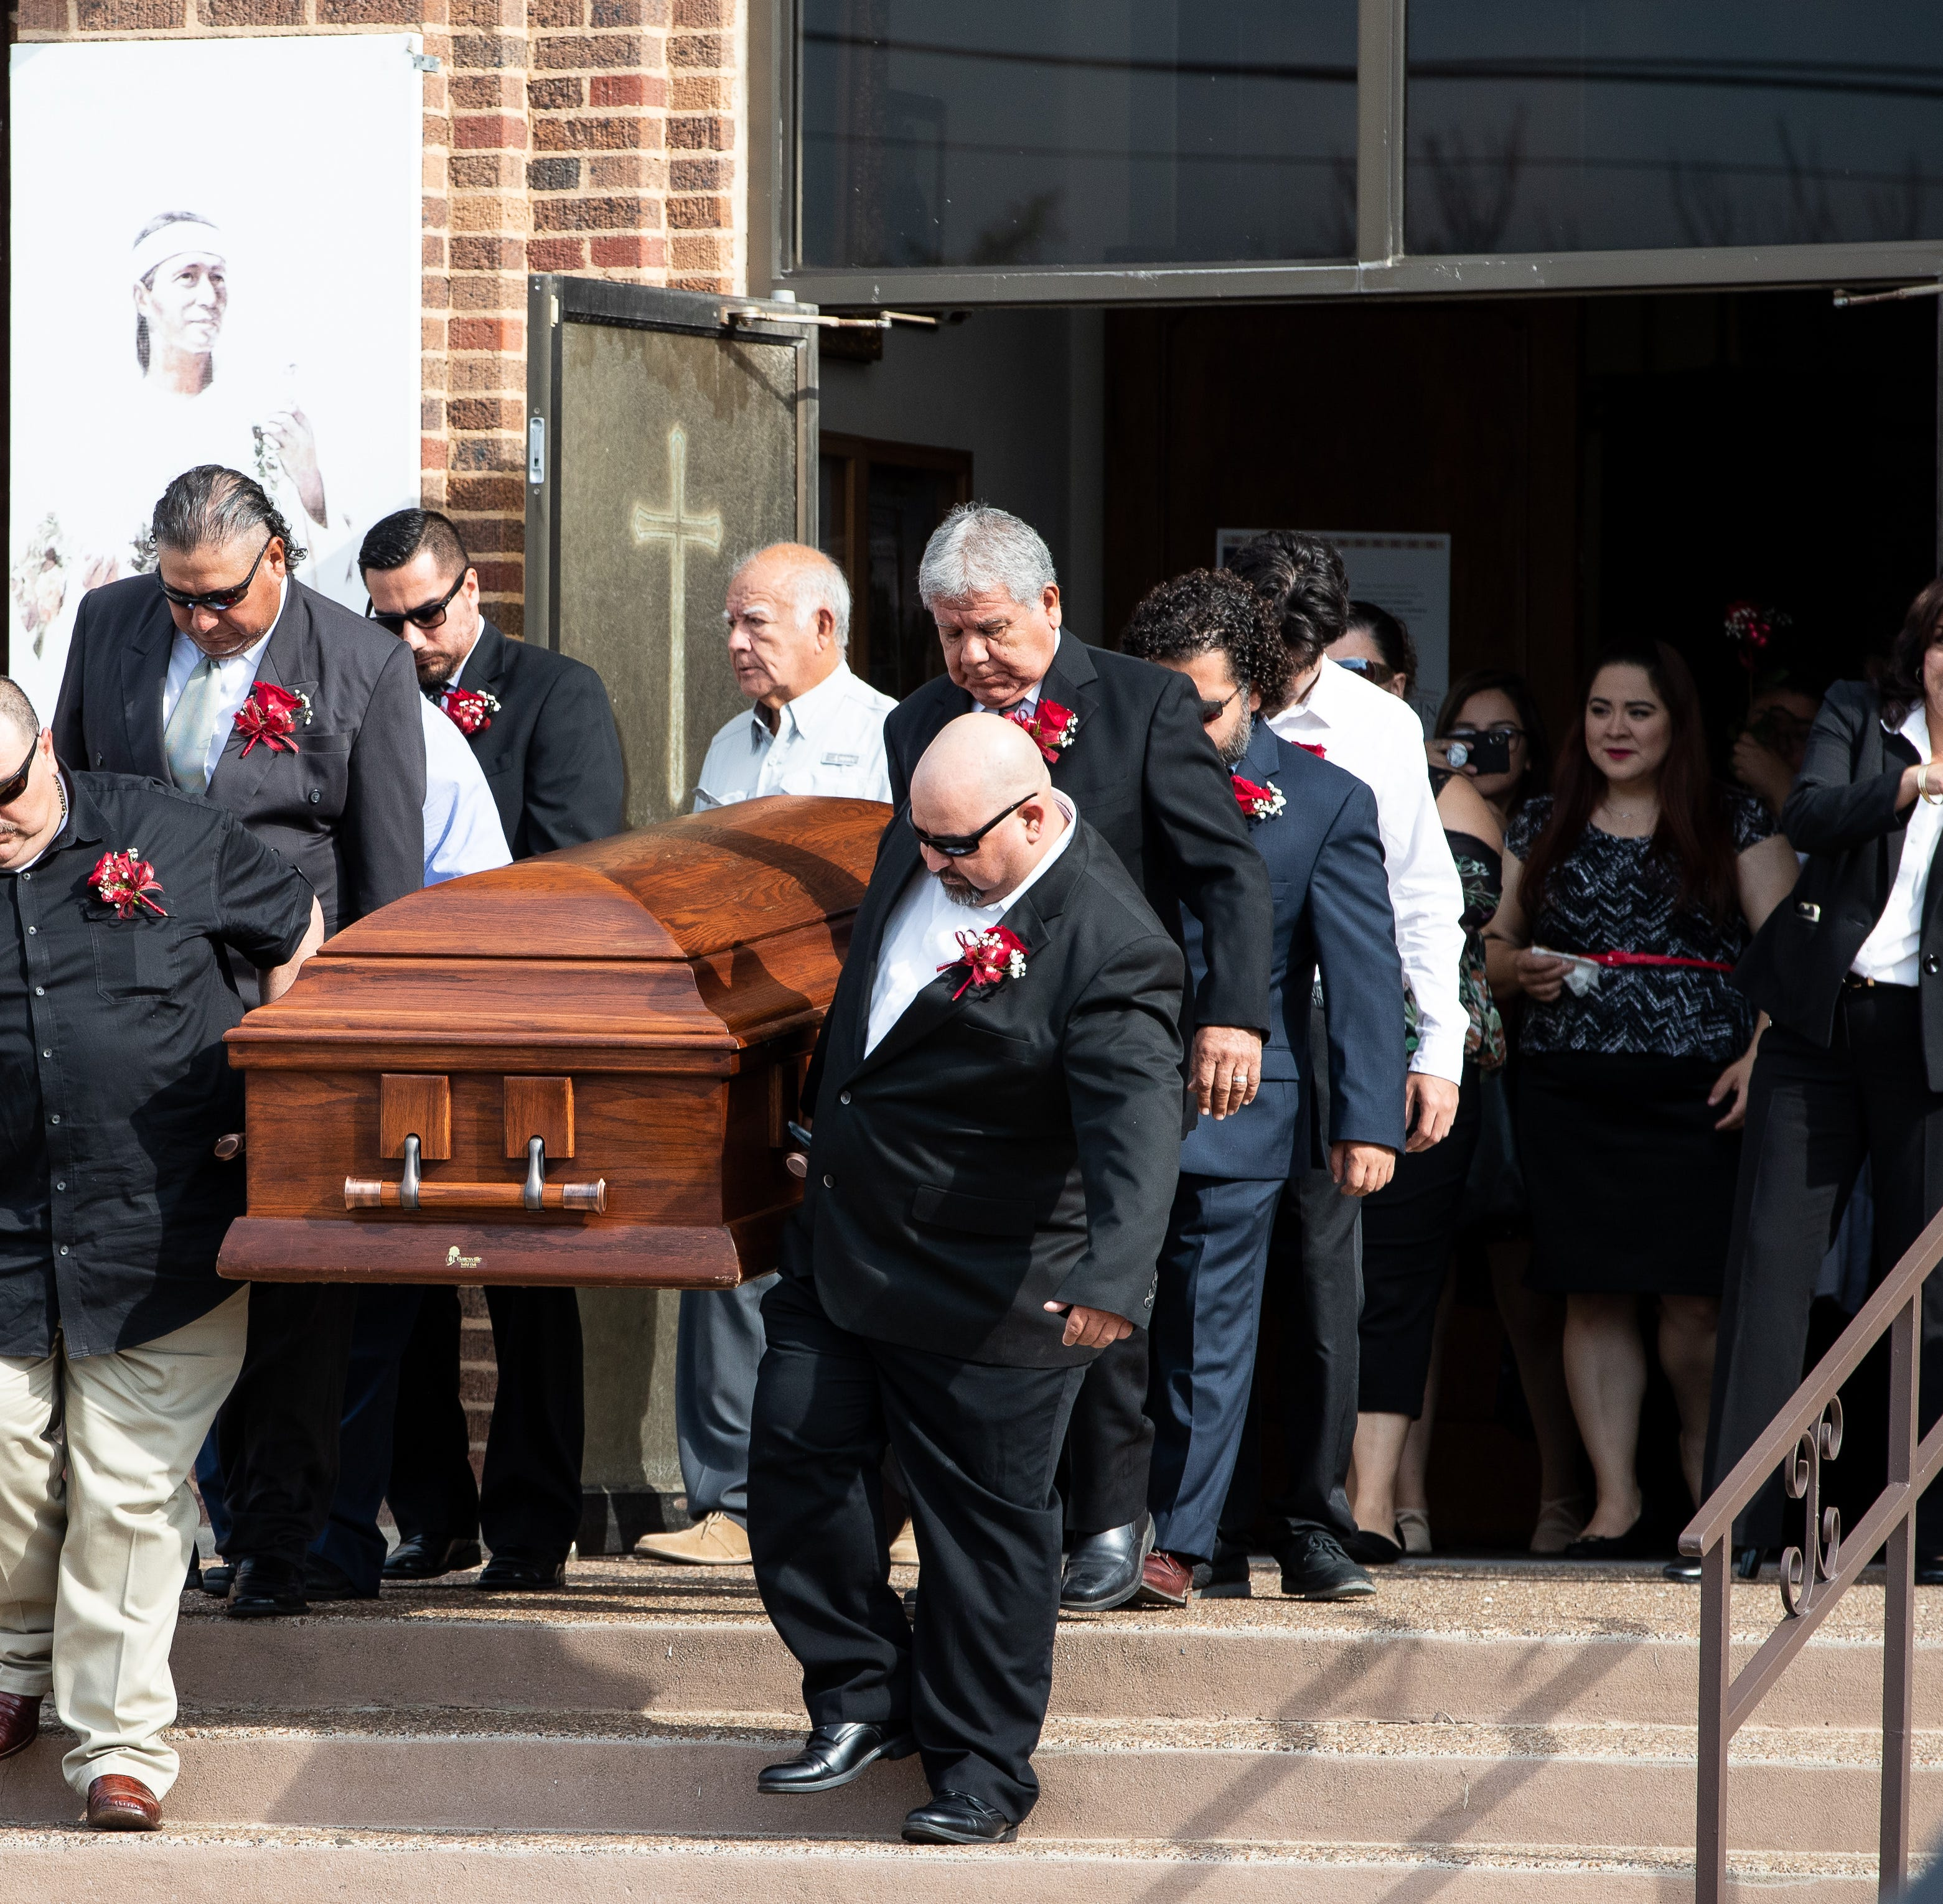 Funerals held for victims of Border Patrol 'serial killer' agent in Laredo, Texas